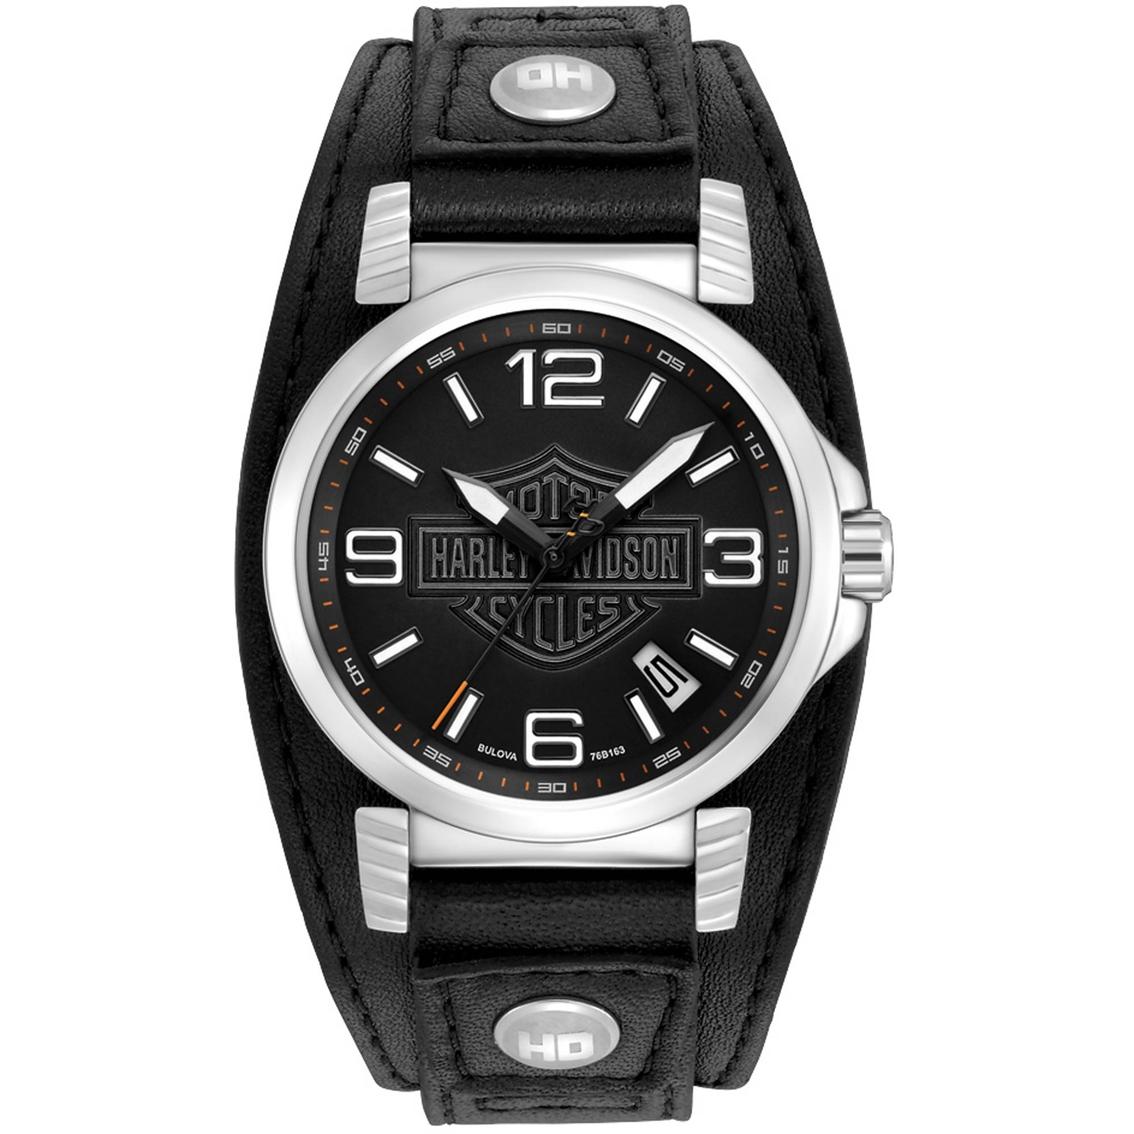 harley davidson by bulova men 39 s watch 76b163 leather